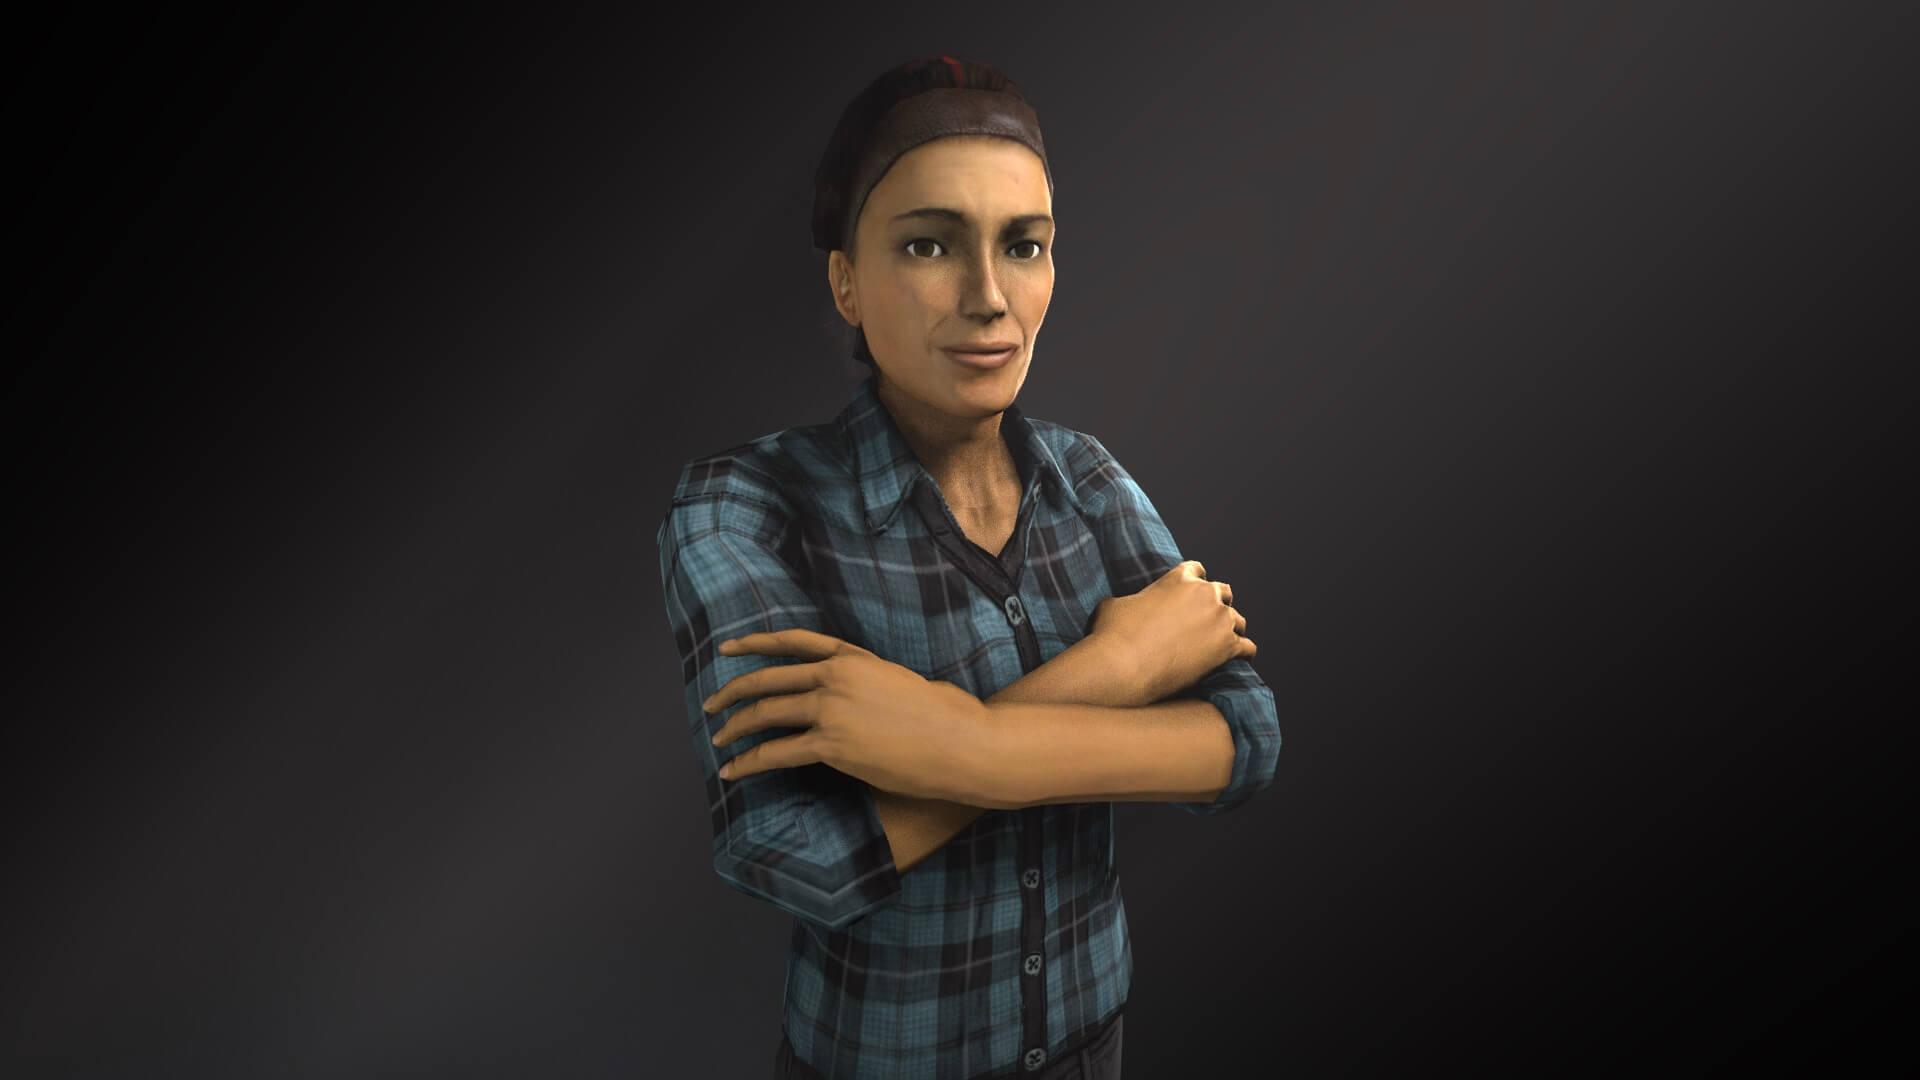 Garry's Mod - Casual Alyx Vance